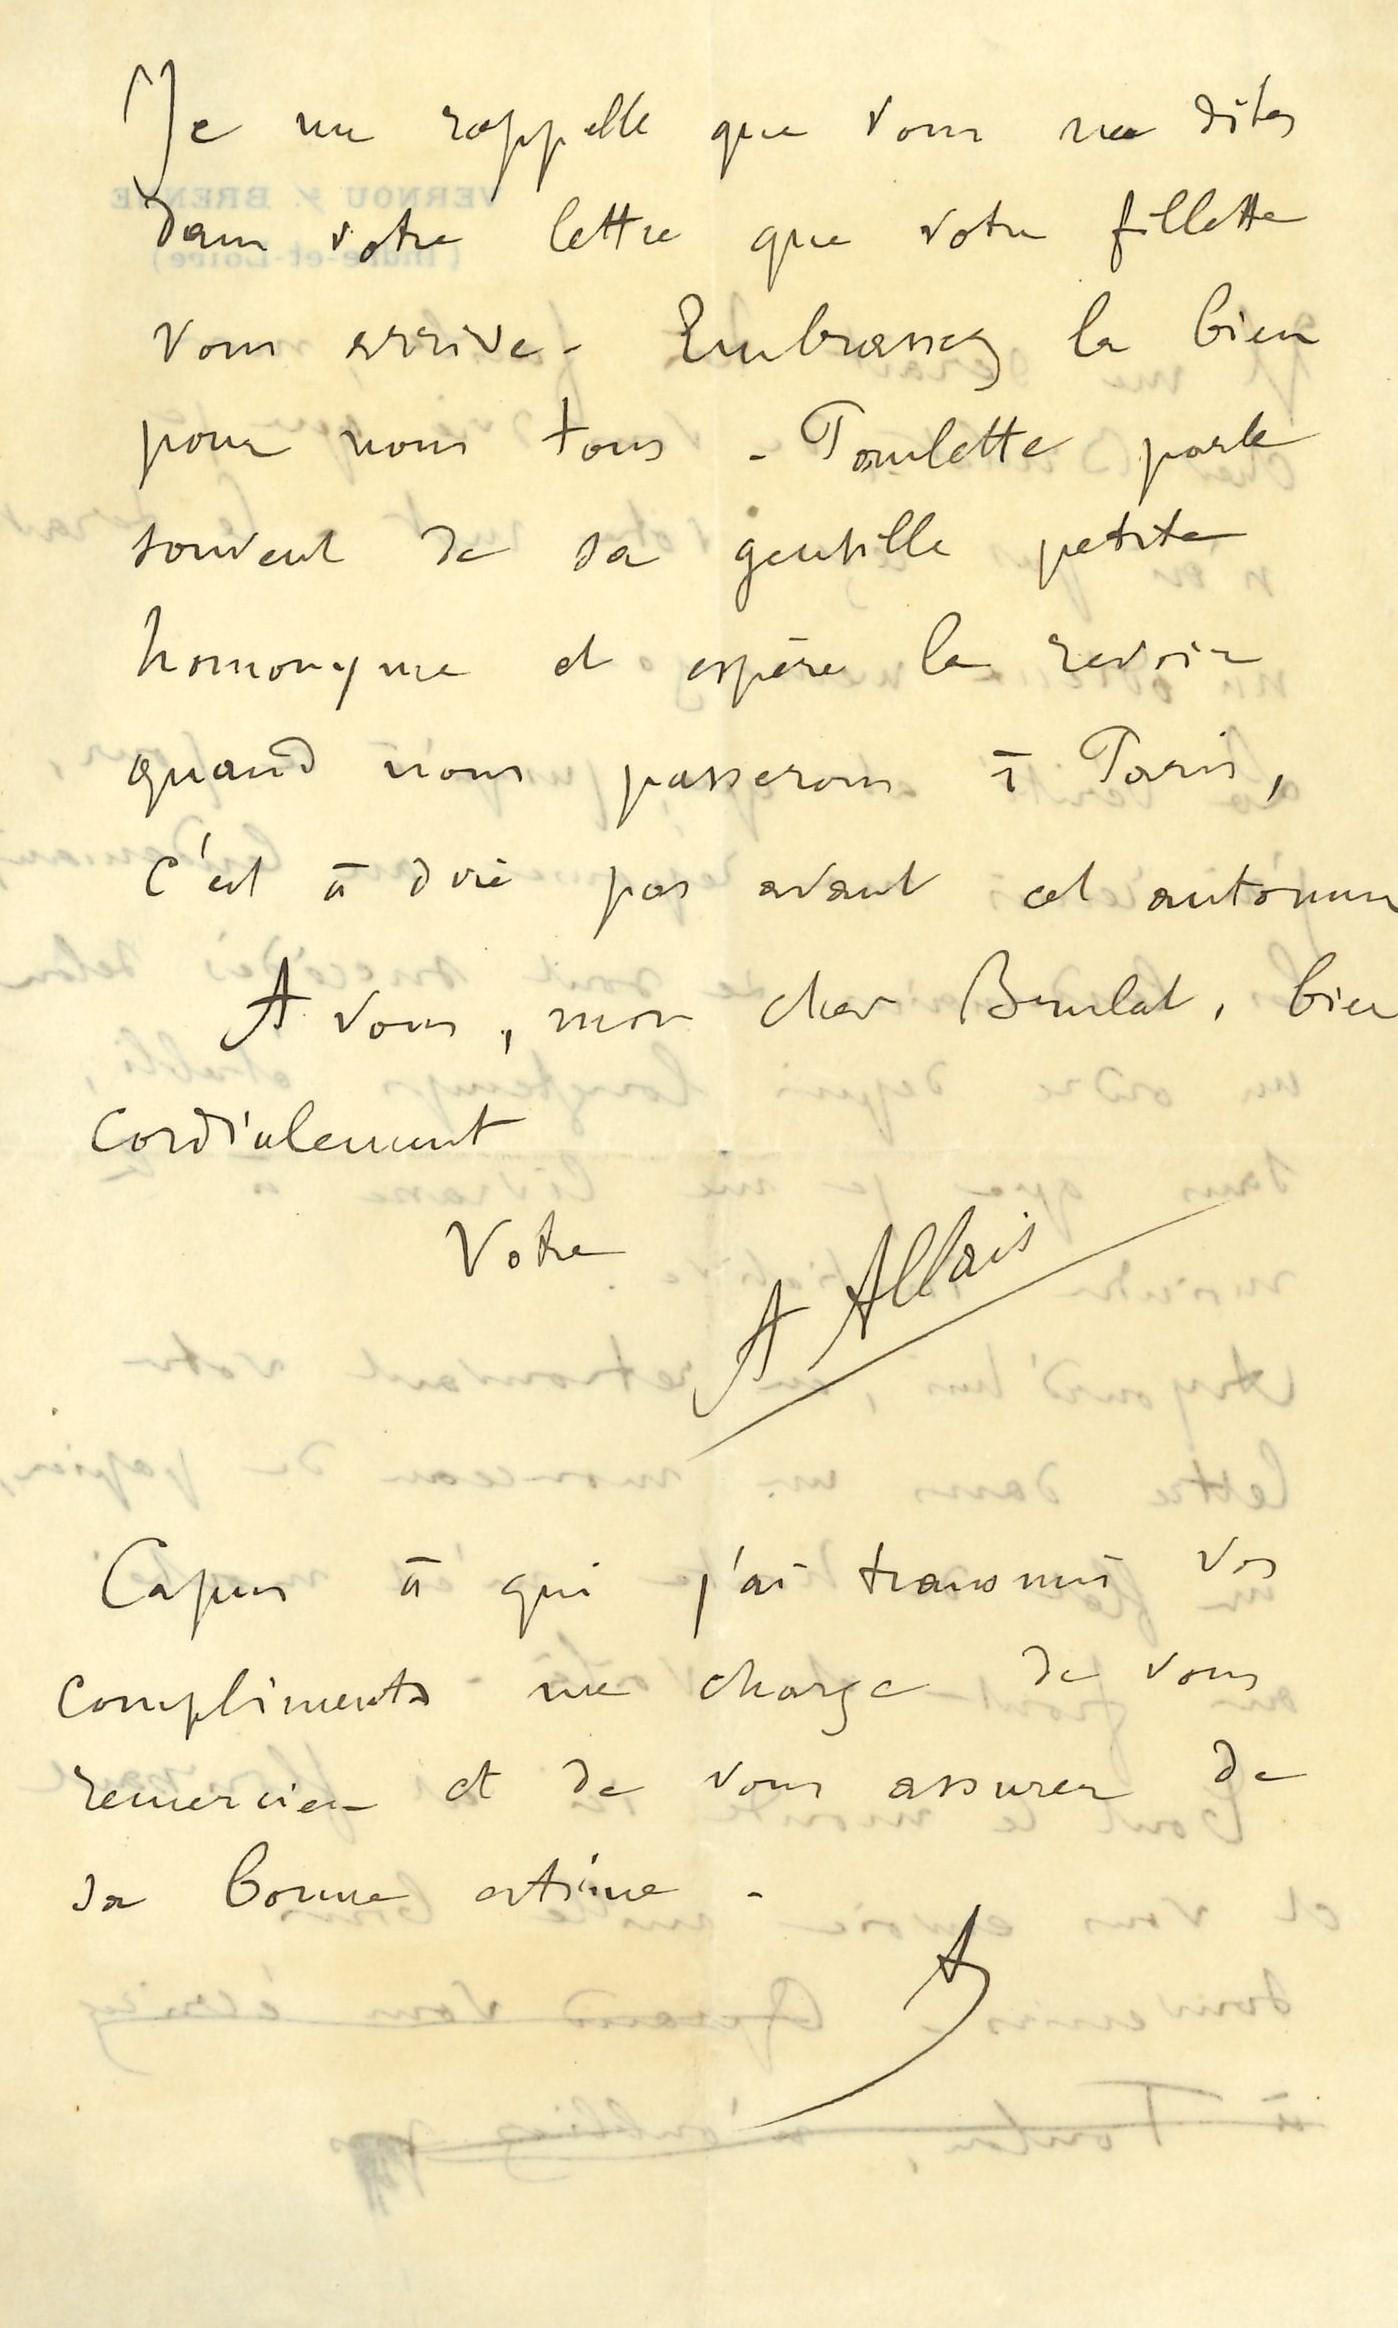 001 Alphonse ALLAIS (1855-1905) écrivain humoriste Image